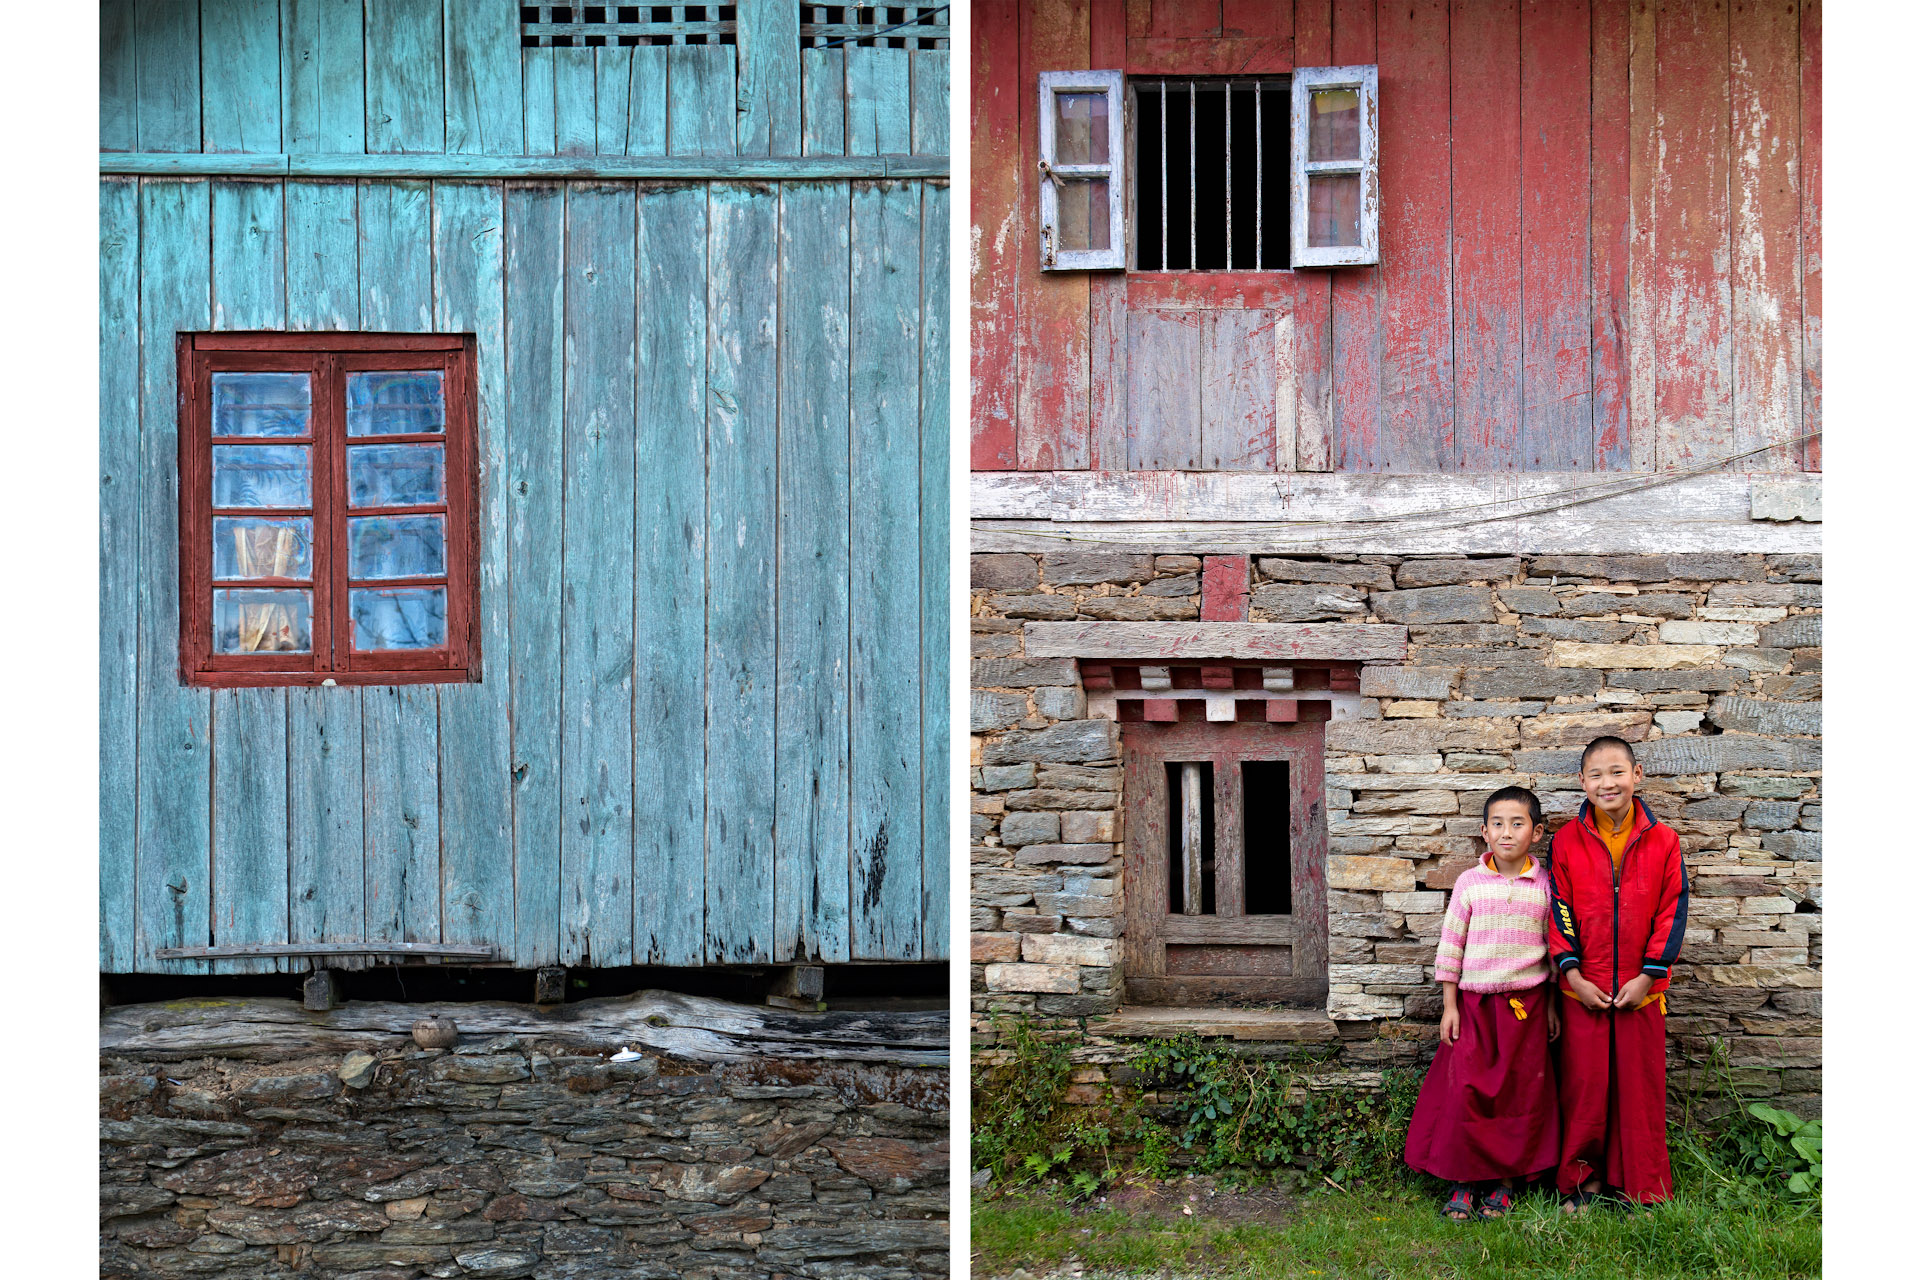 India-Sikkim-Travel-Pemayangtse-Monastery-Kid-Monk.JPG